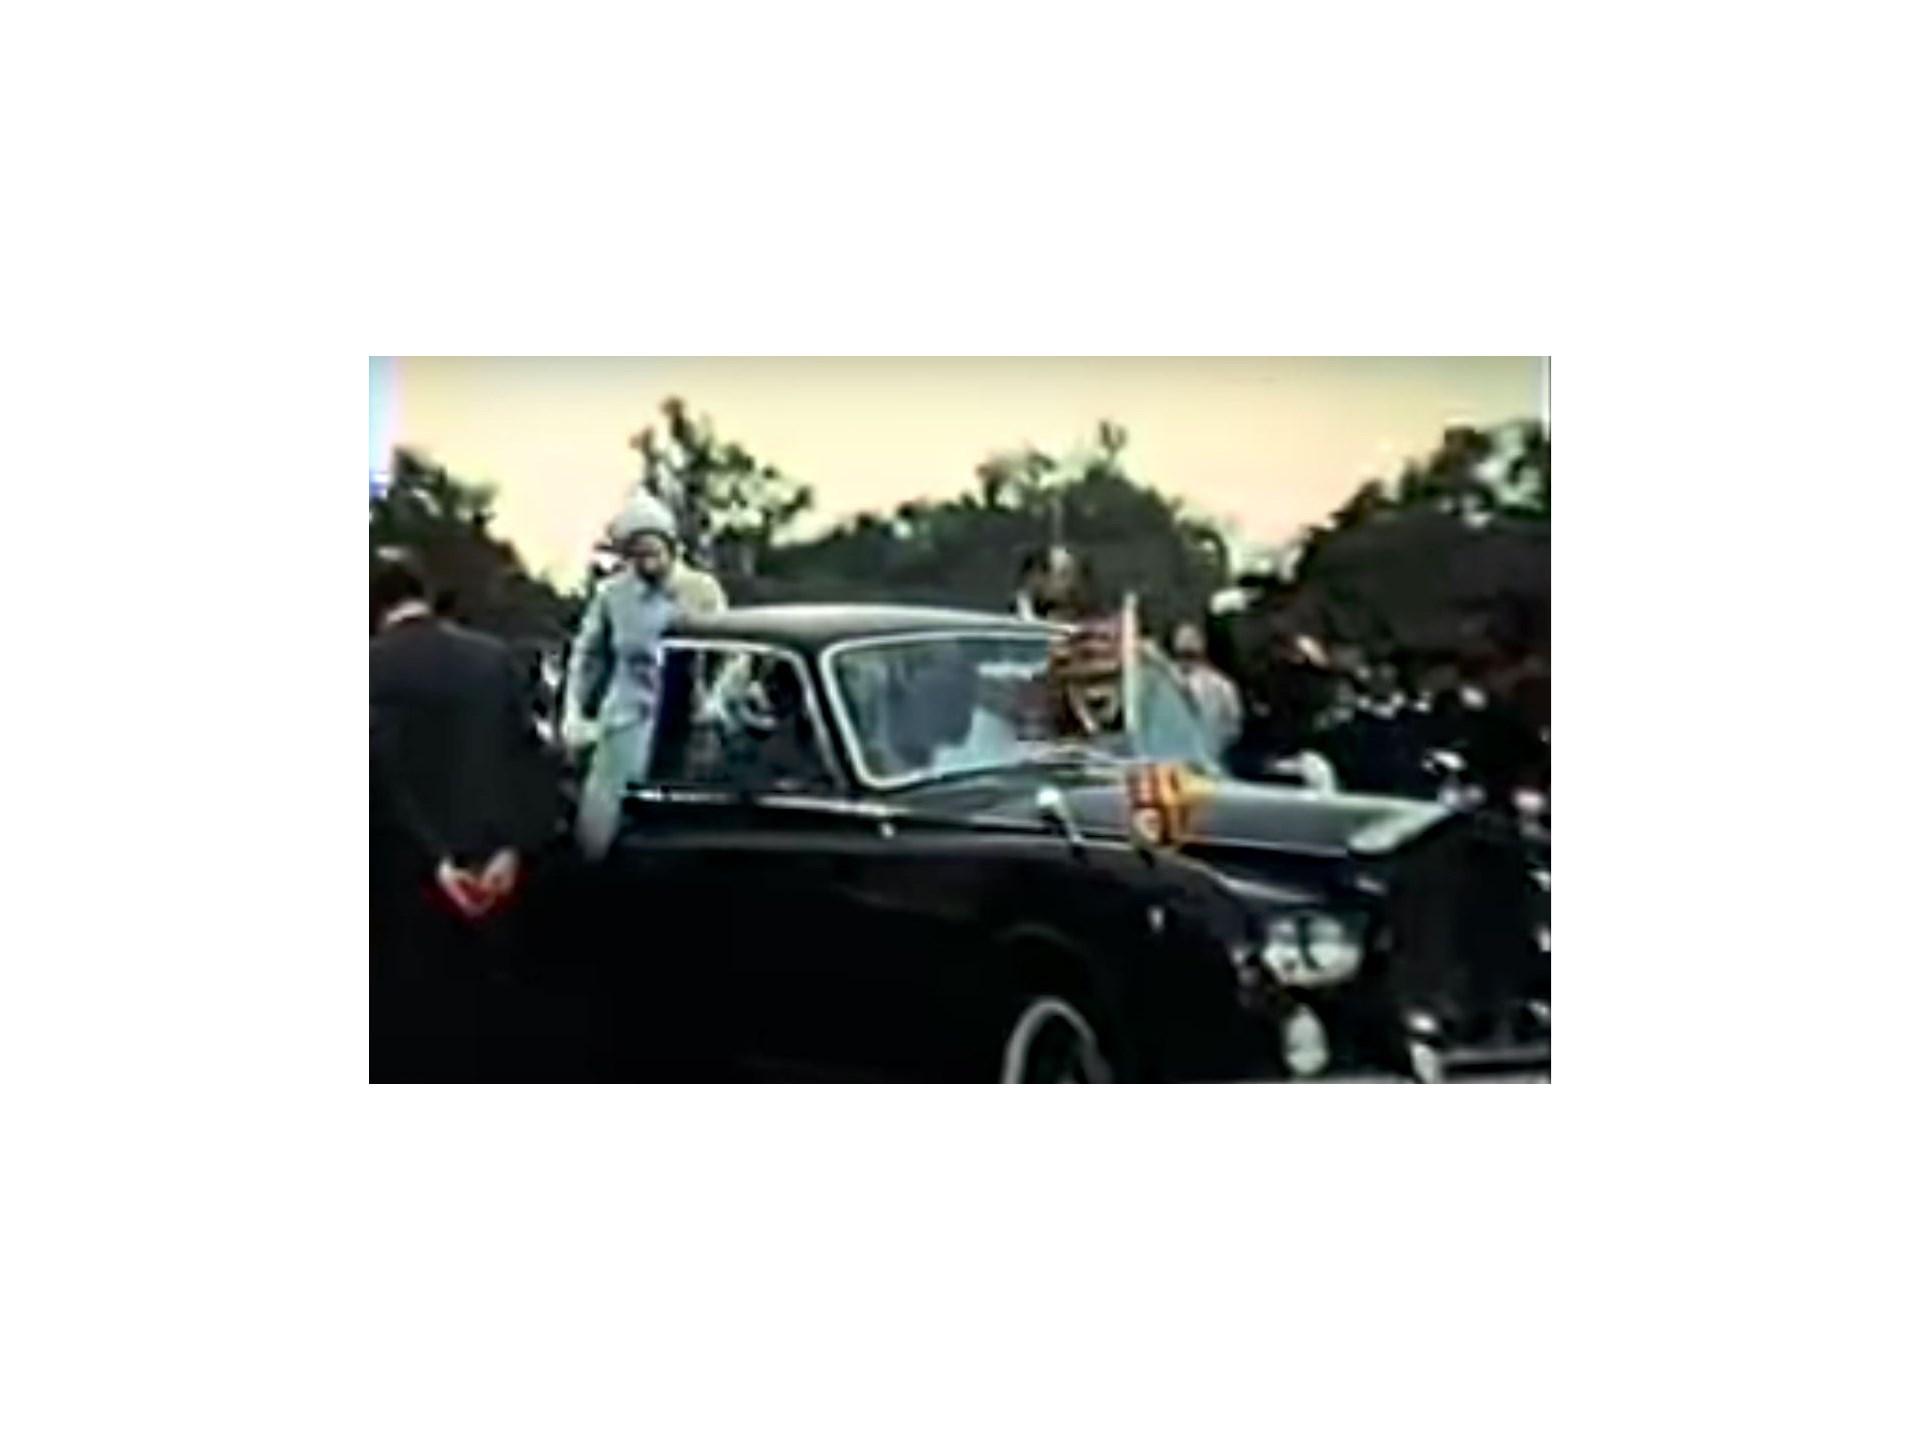 1967 Rolls-Royce Phantom V State Landaulet by Mulliner Park Ward